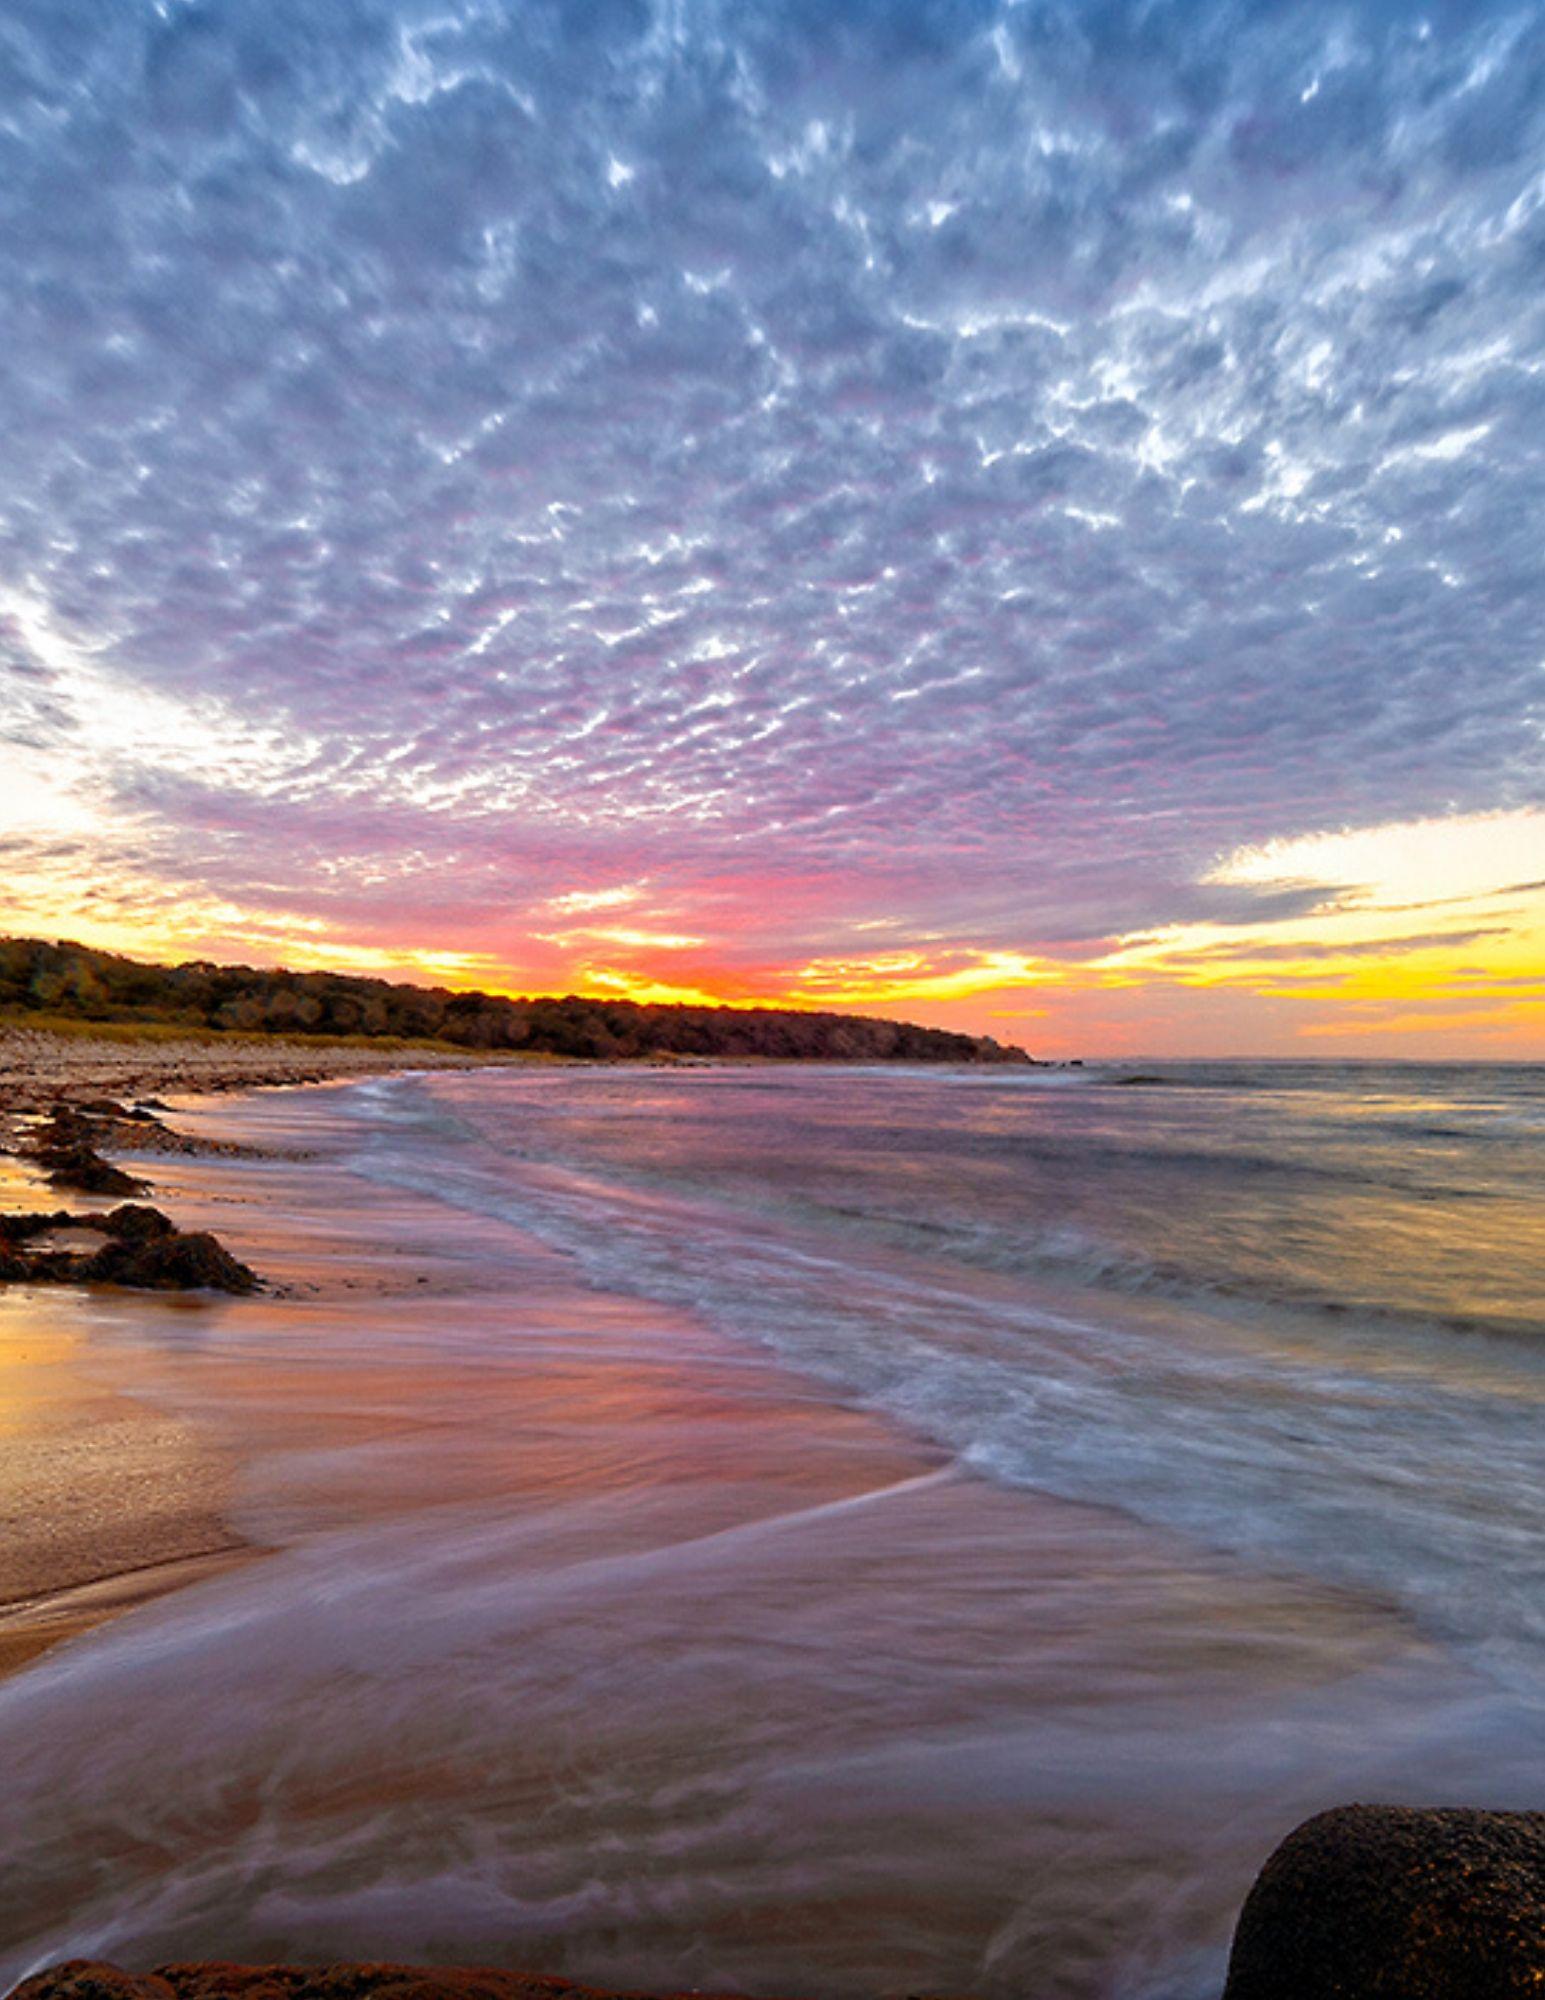 John Montes Jr Photography Best Places to Photograph Sunrise and Sunset on Marthas Vineyard-Best Places to Photograph Sunrise and Sunset on Marthas Vineyard-29